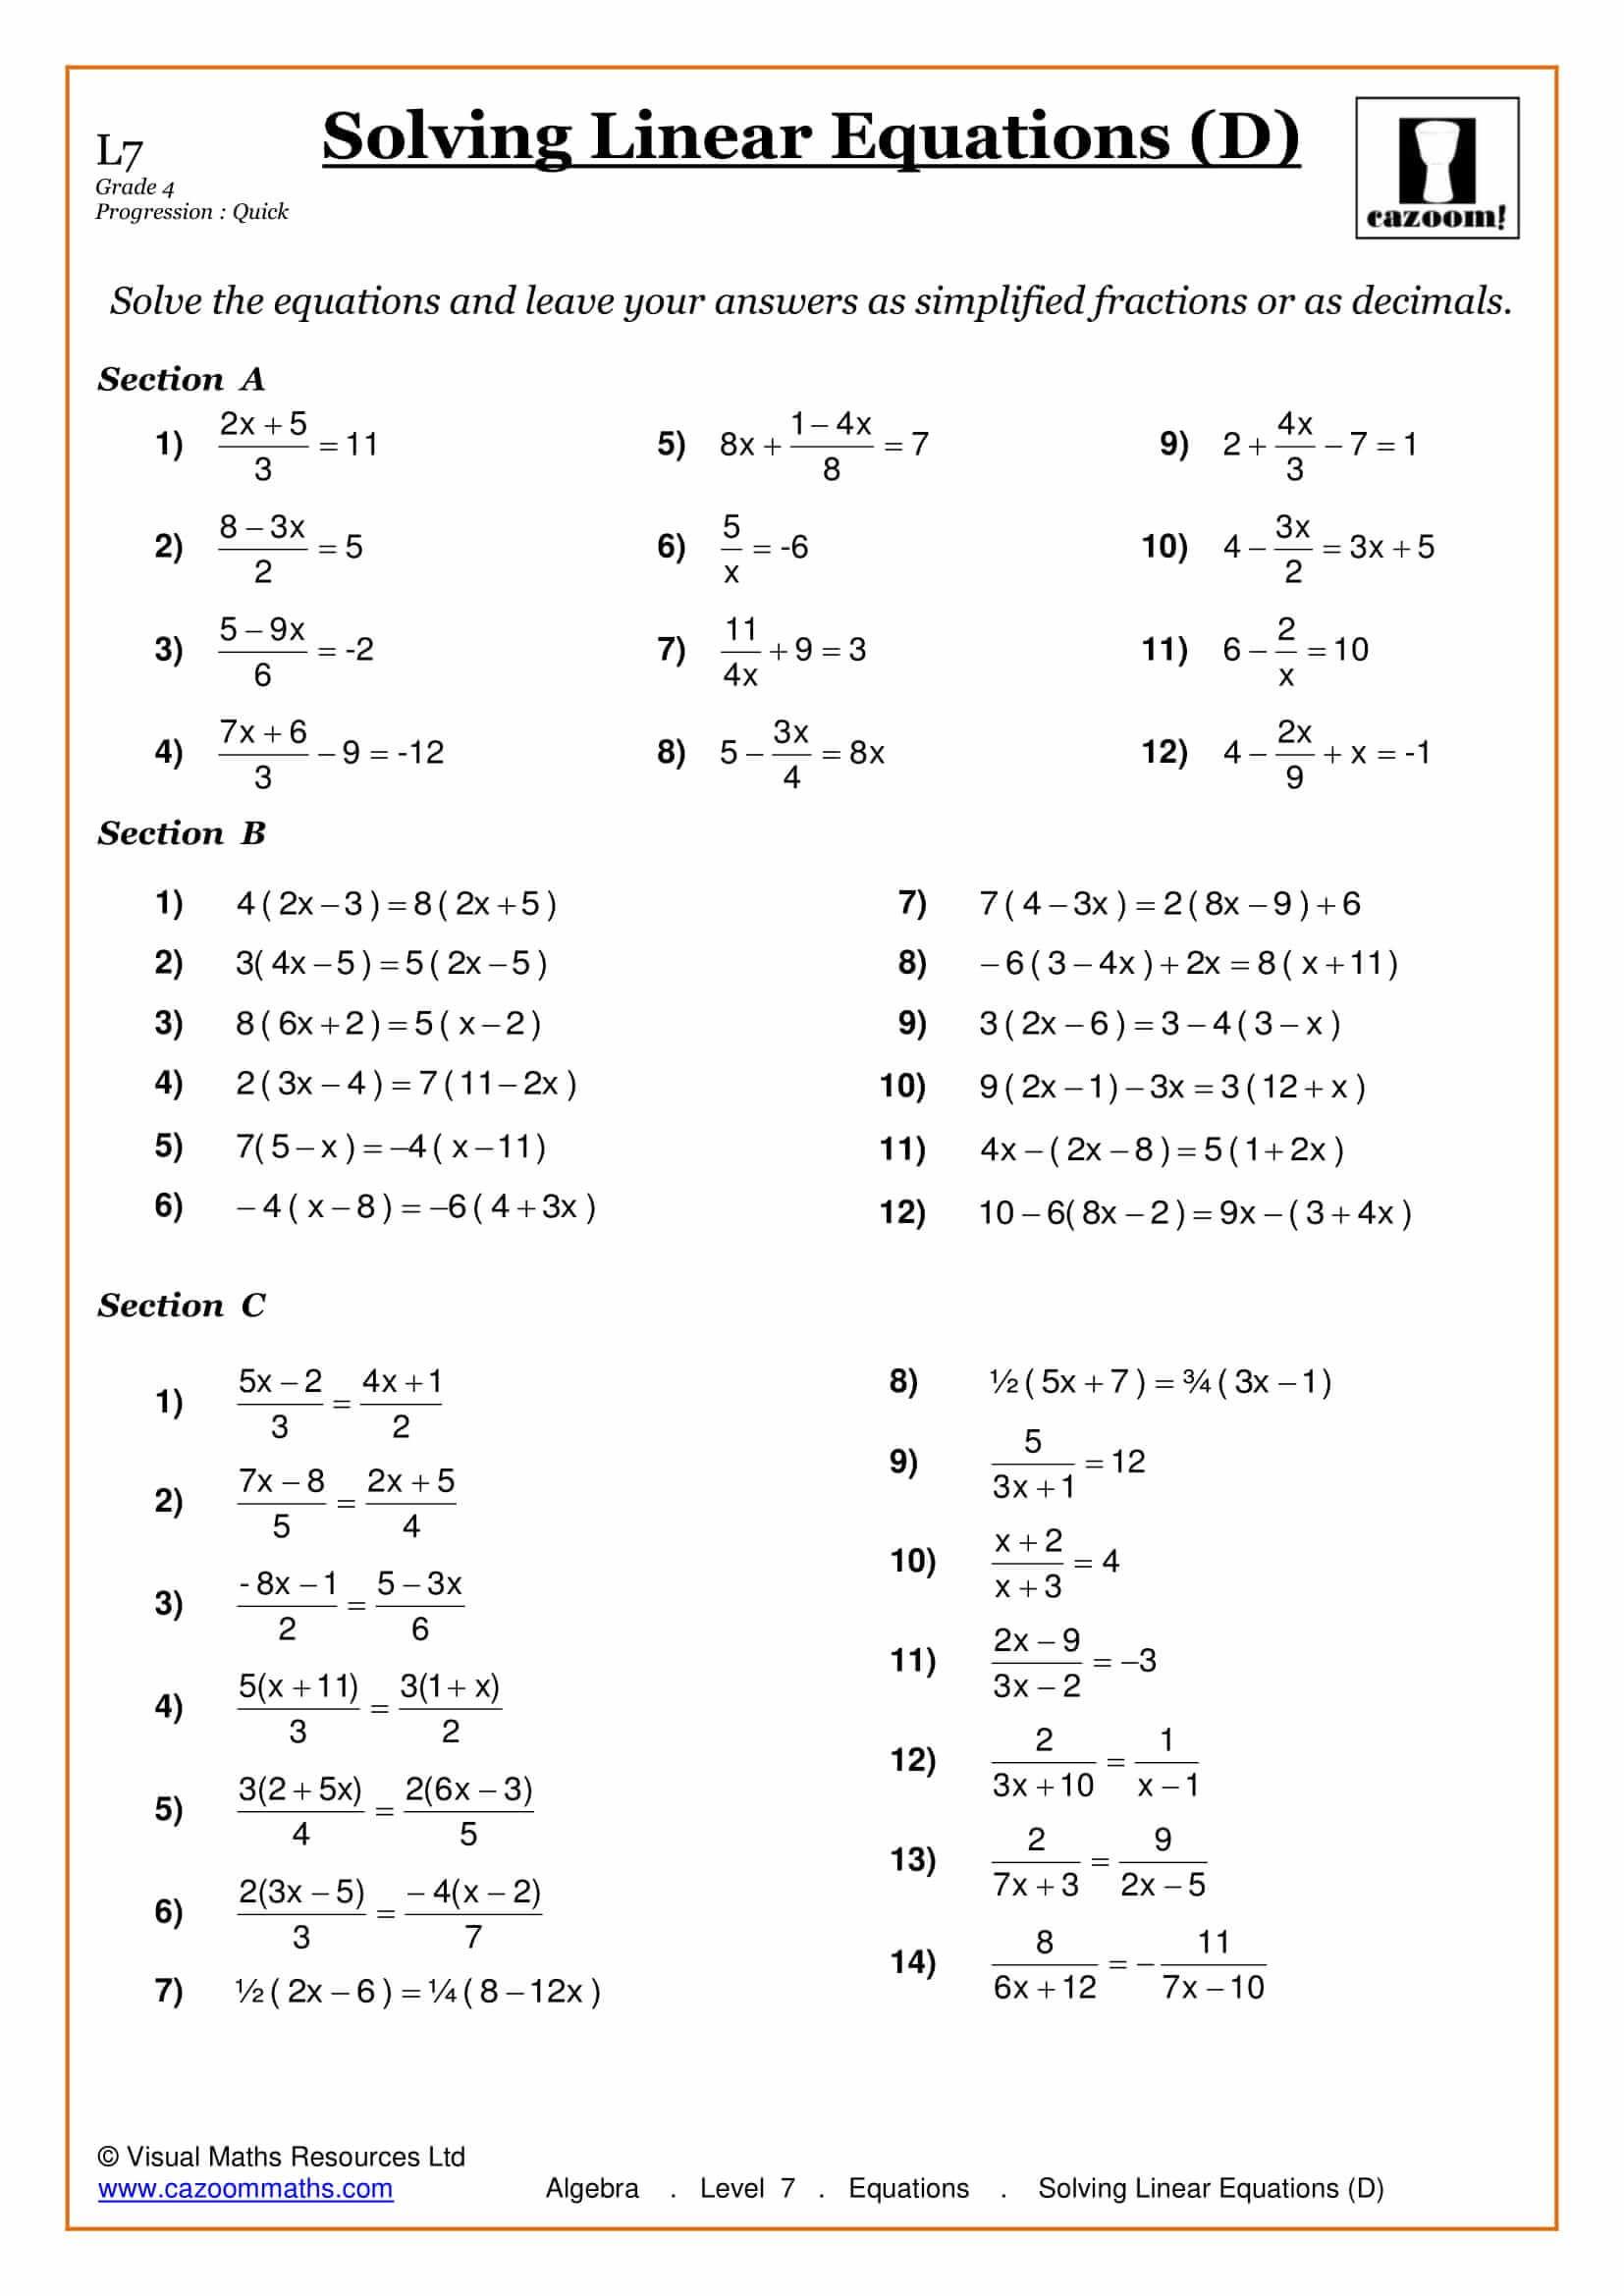 hight resolution of Solving Equations Maths Worksheet - cazoommaths.com   Algebra worksheets